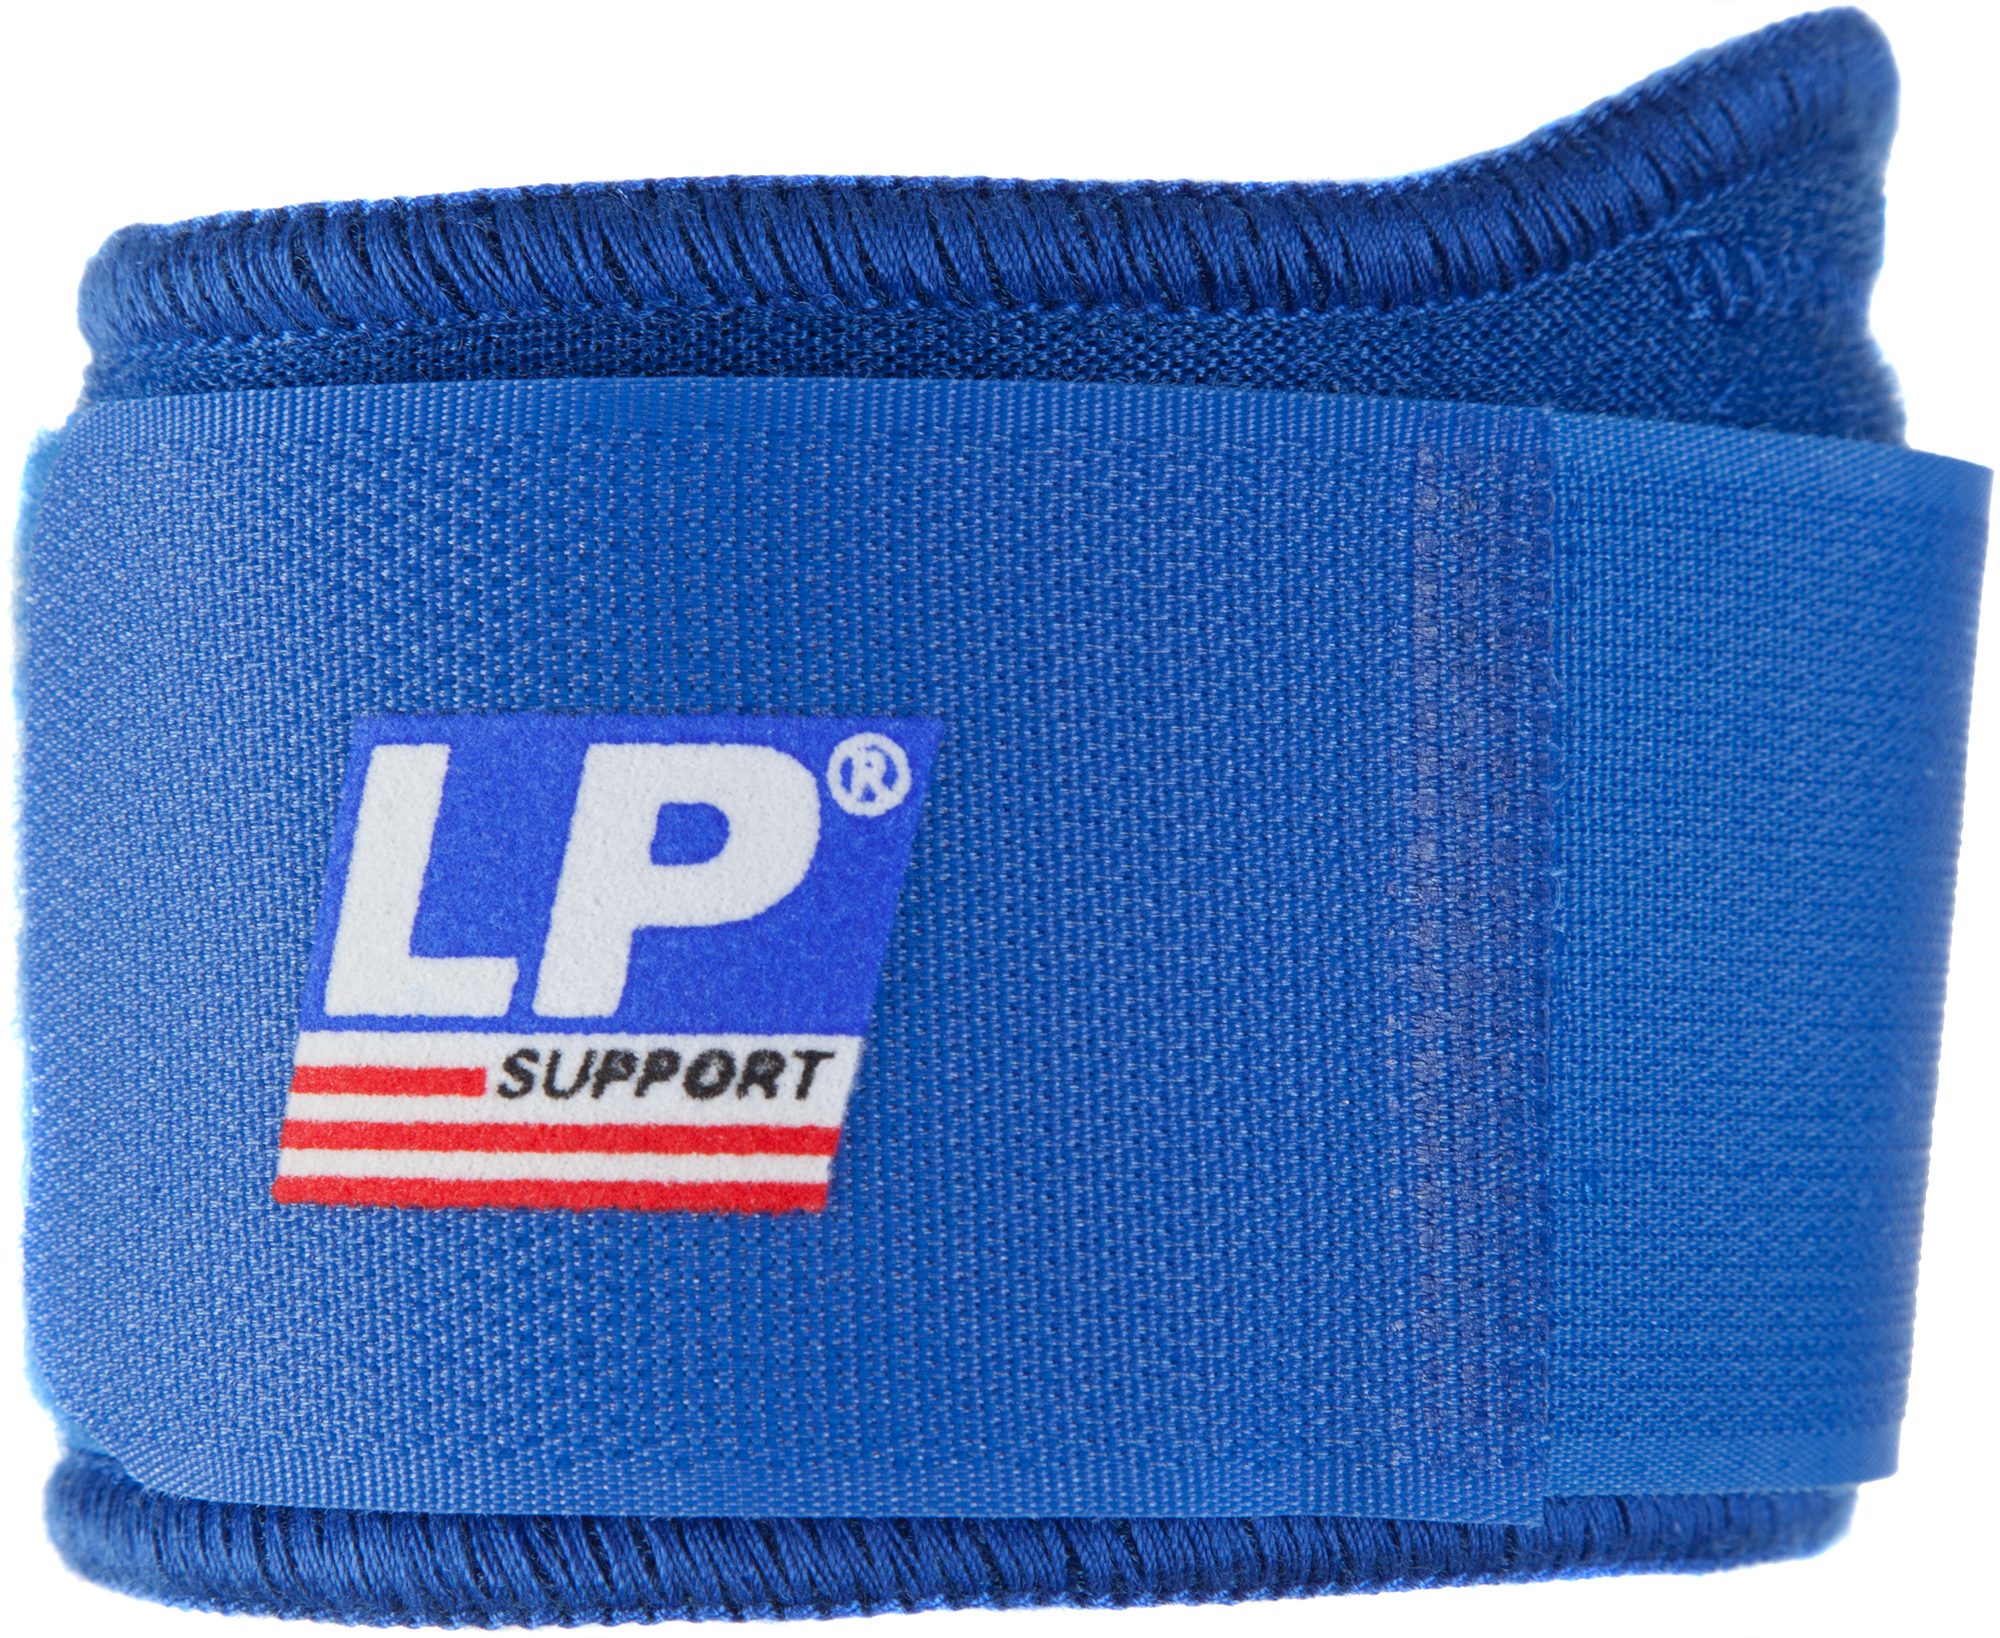 LP Support Суппорт локтя  751, размер Без размера